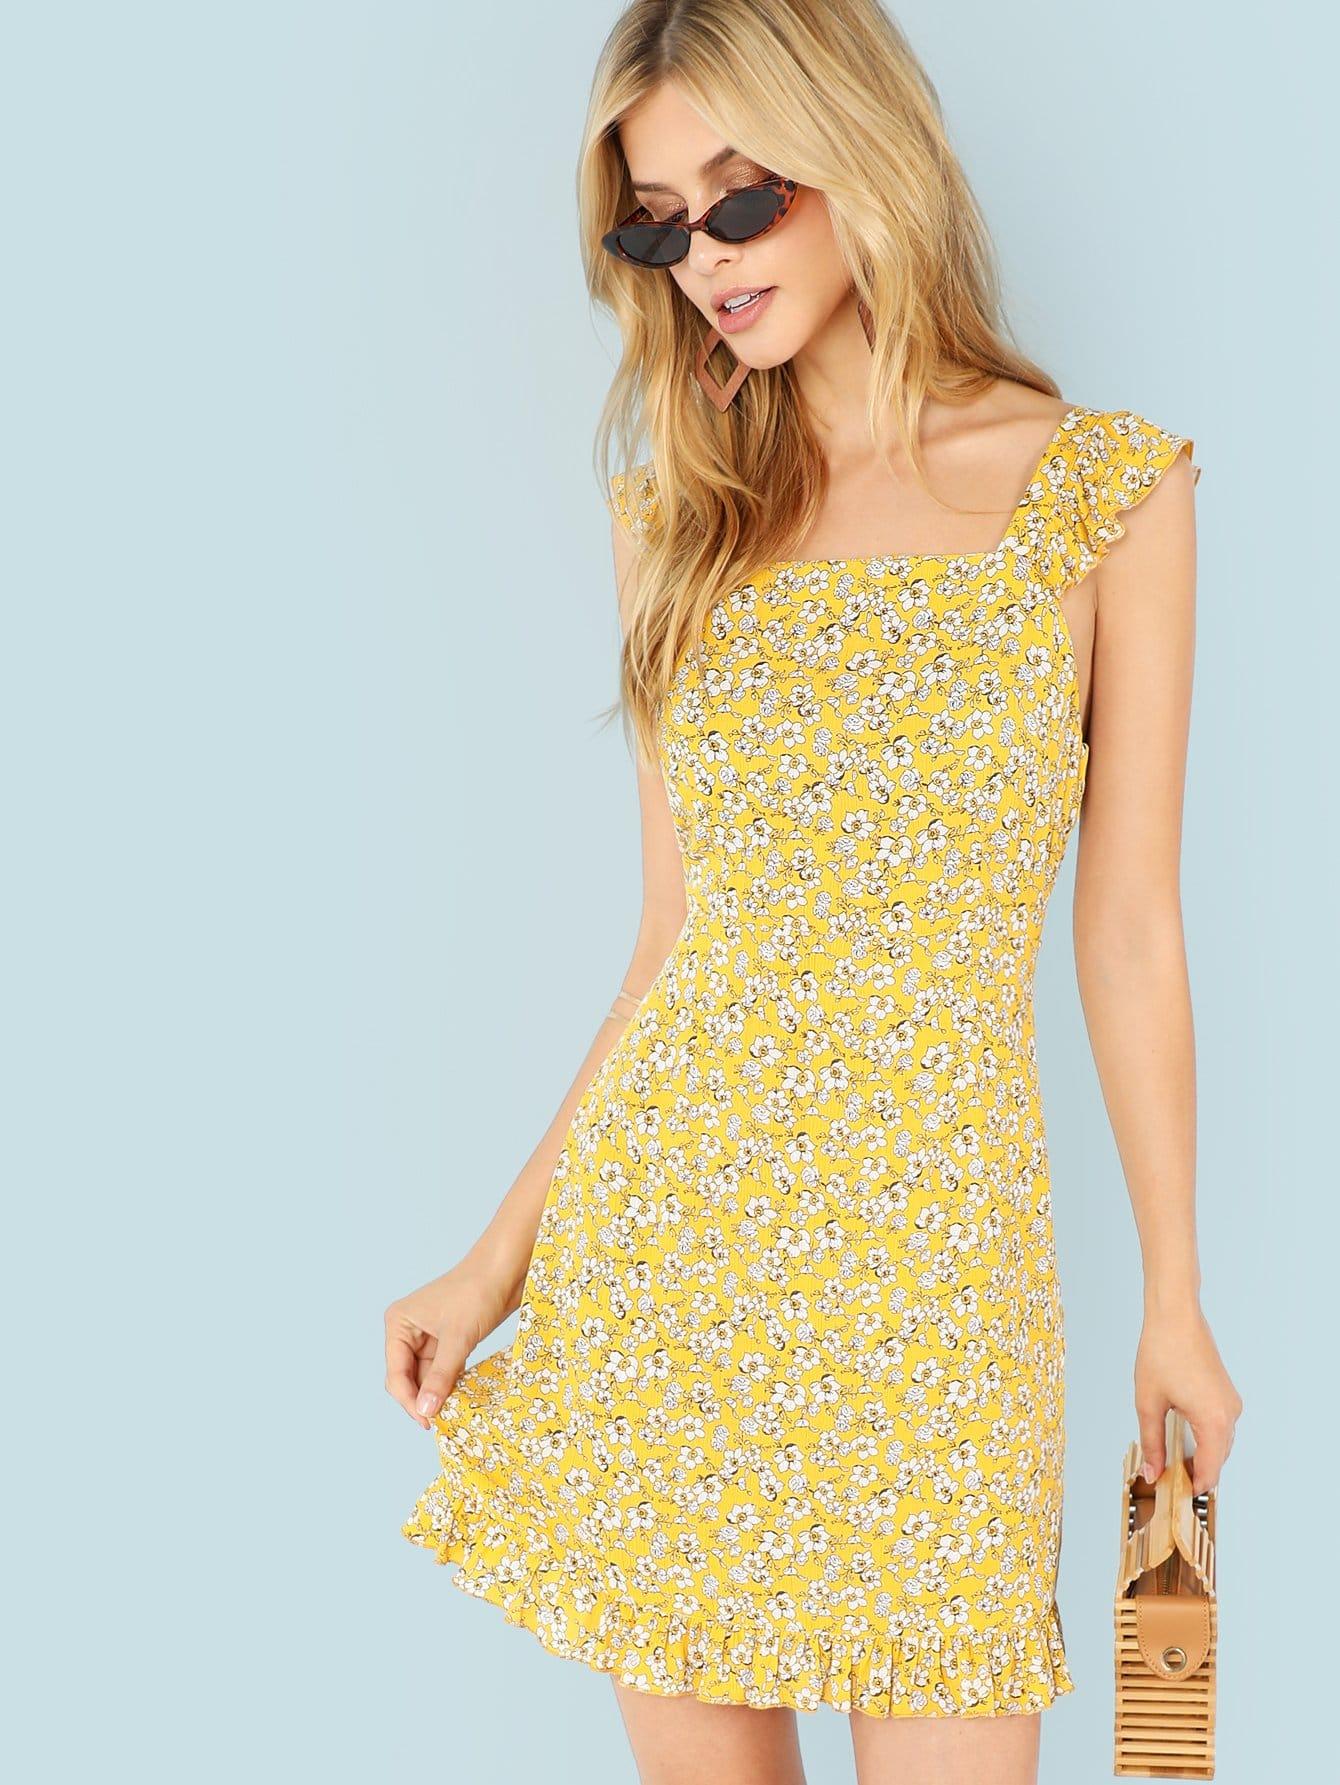 Ruffle Strap and Hem Floral Dress ruffle strap and hem striped dress